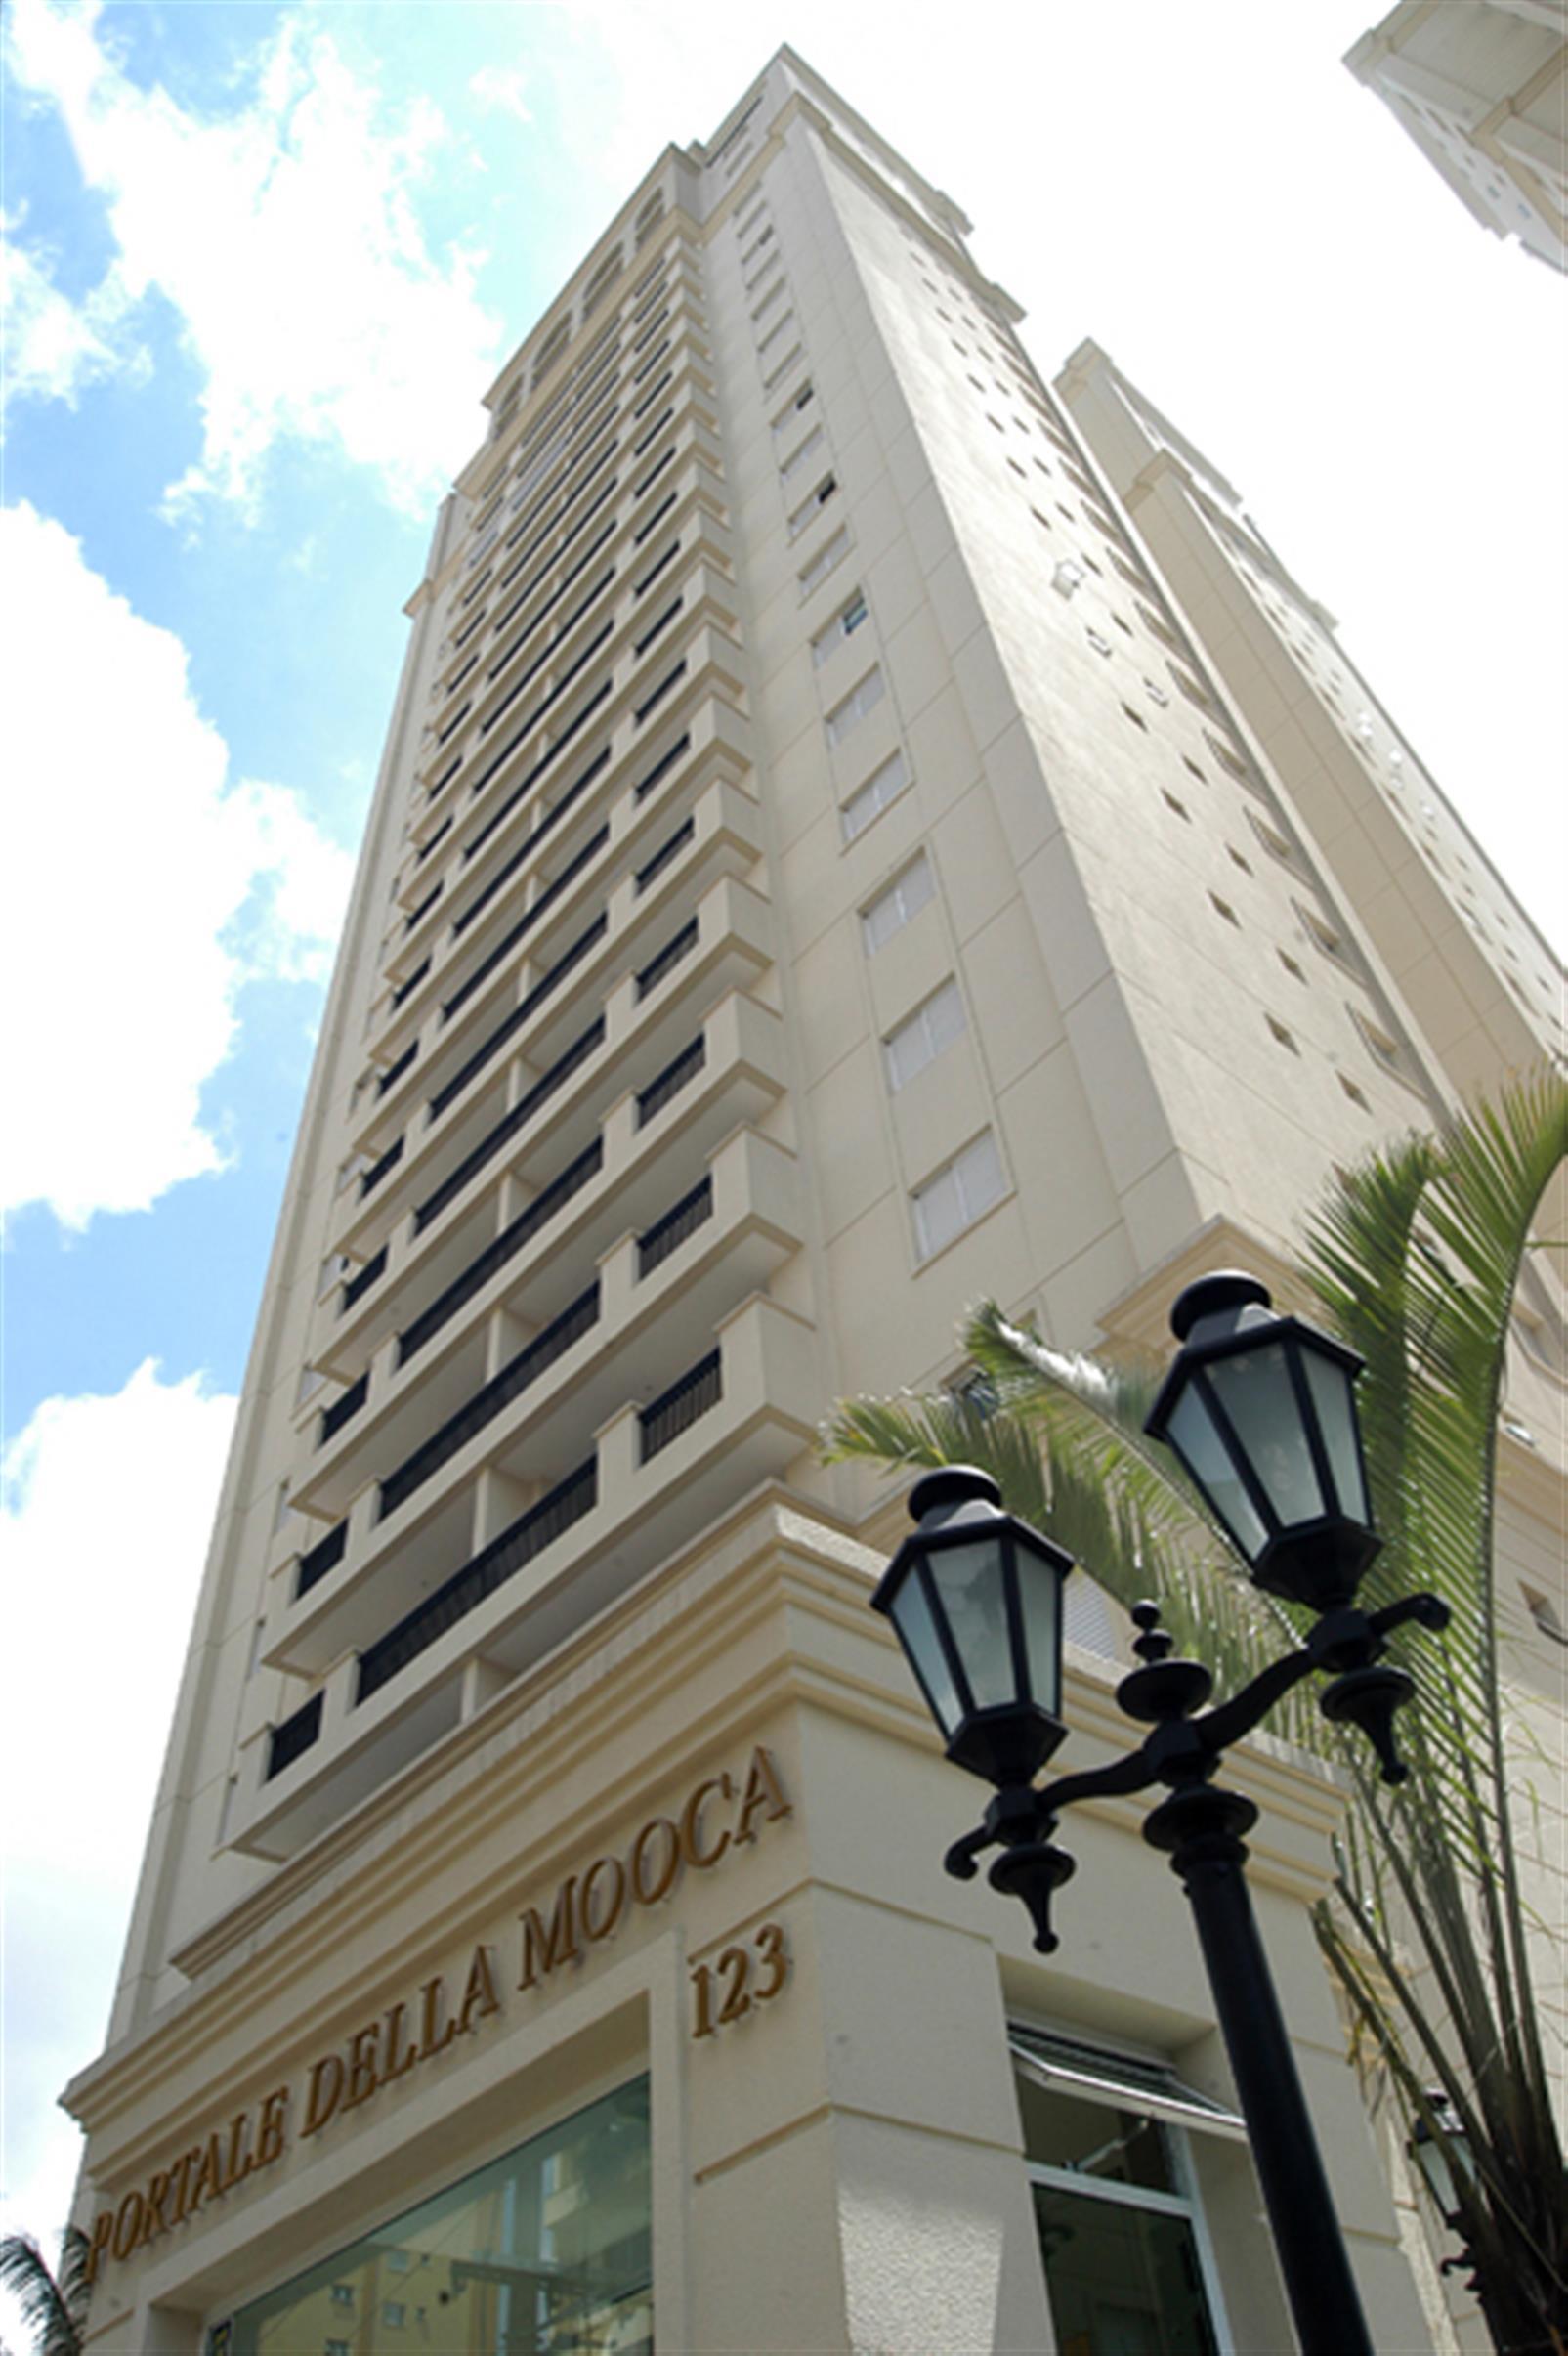 Fachada | Portale della Mooca – Apartamentona  Mooca - São Paulo - São Paulo